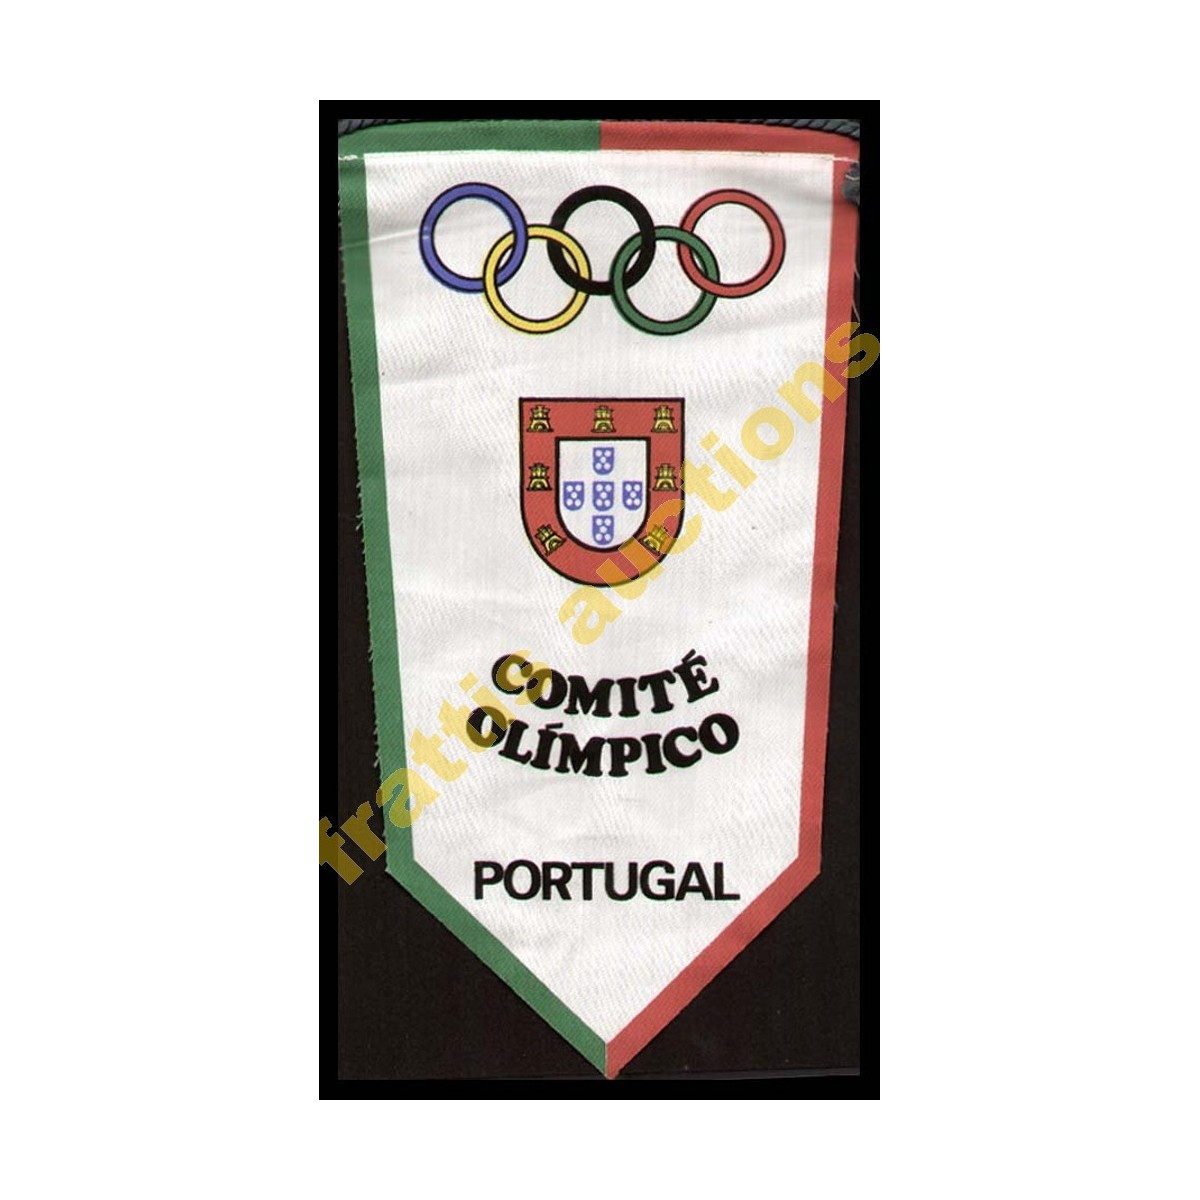 PORTUGAL - National Olympic Committee (NOC) Baner  Μικρό πανό Ολυμπιακή Επιτροπή της Πορτογαλίας.